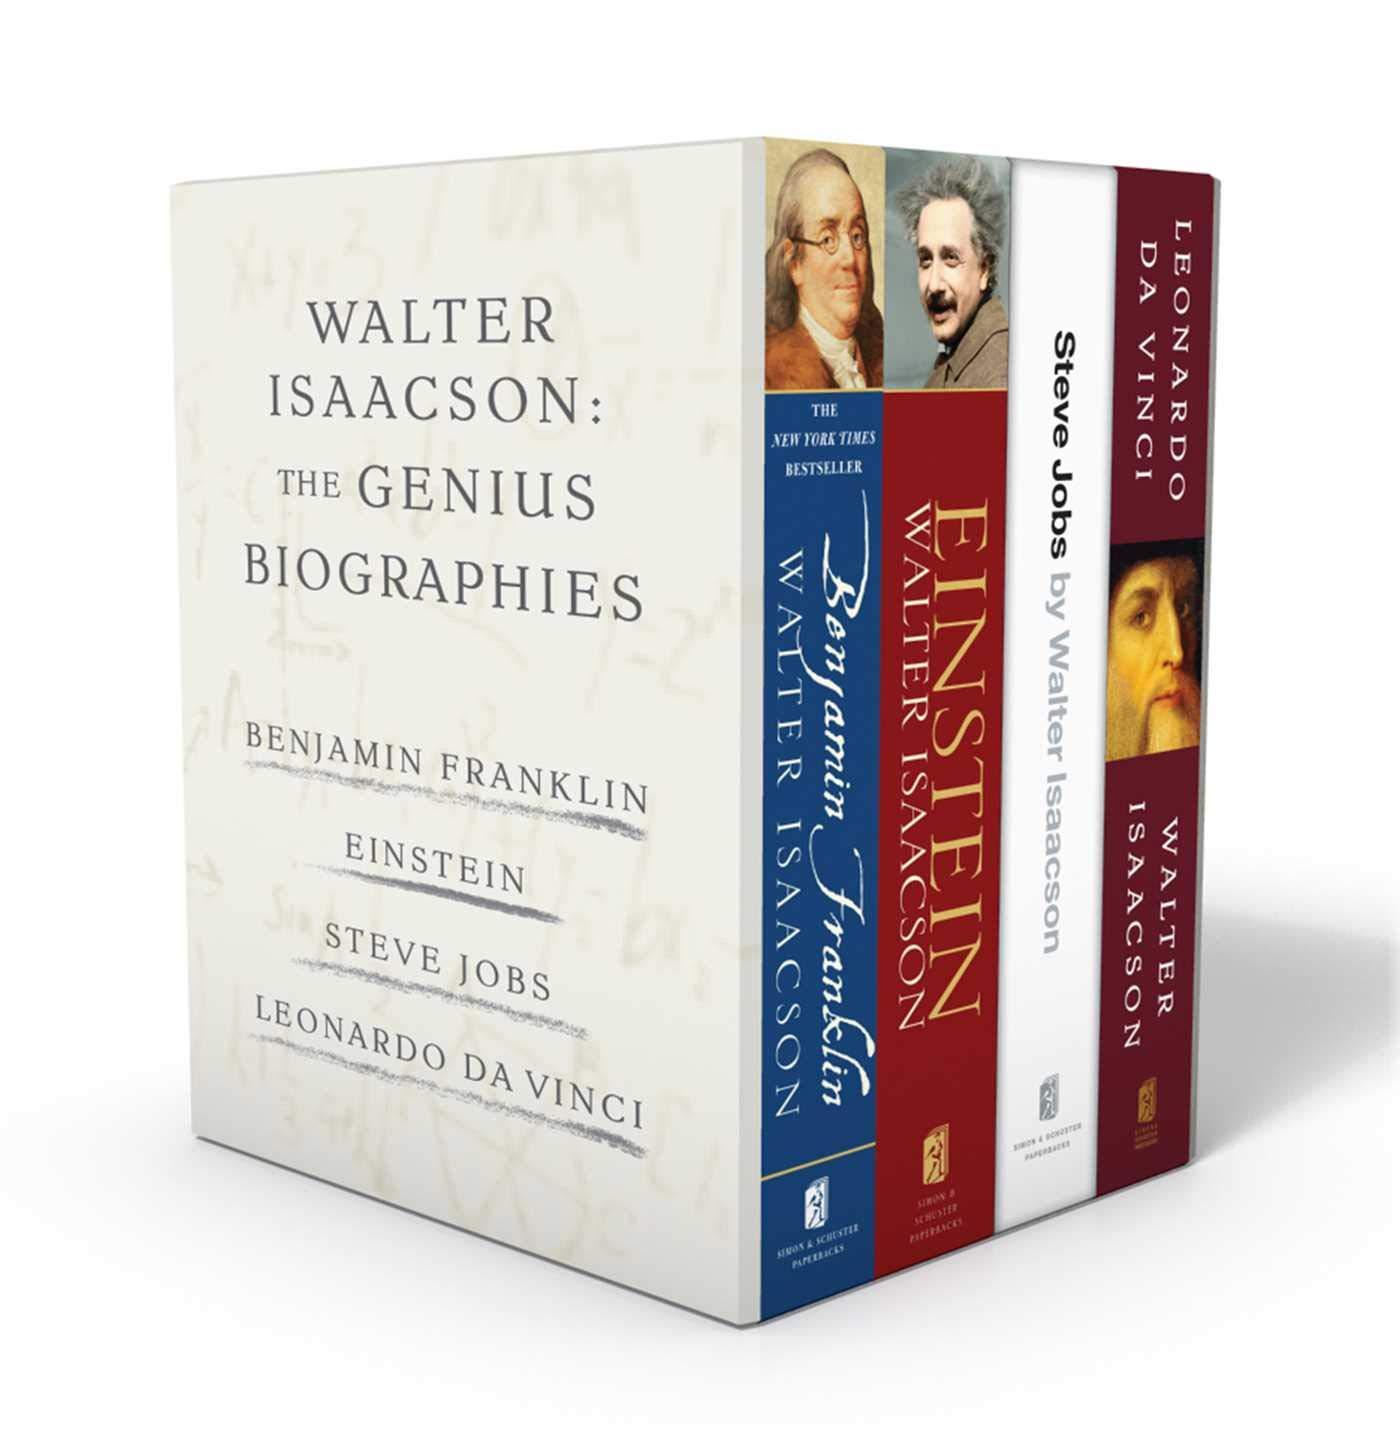 Walter Isaacson: The Genius Biographies: Benjamin Franklin, Einstein, Steve Jobs, and Leonardo da Vinci by Simon & Schuster